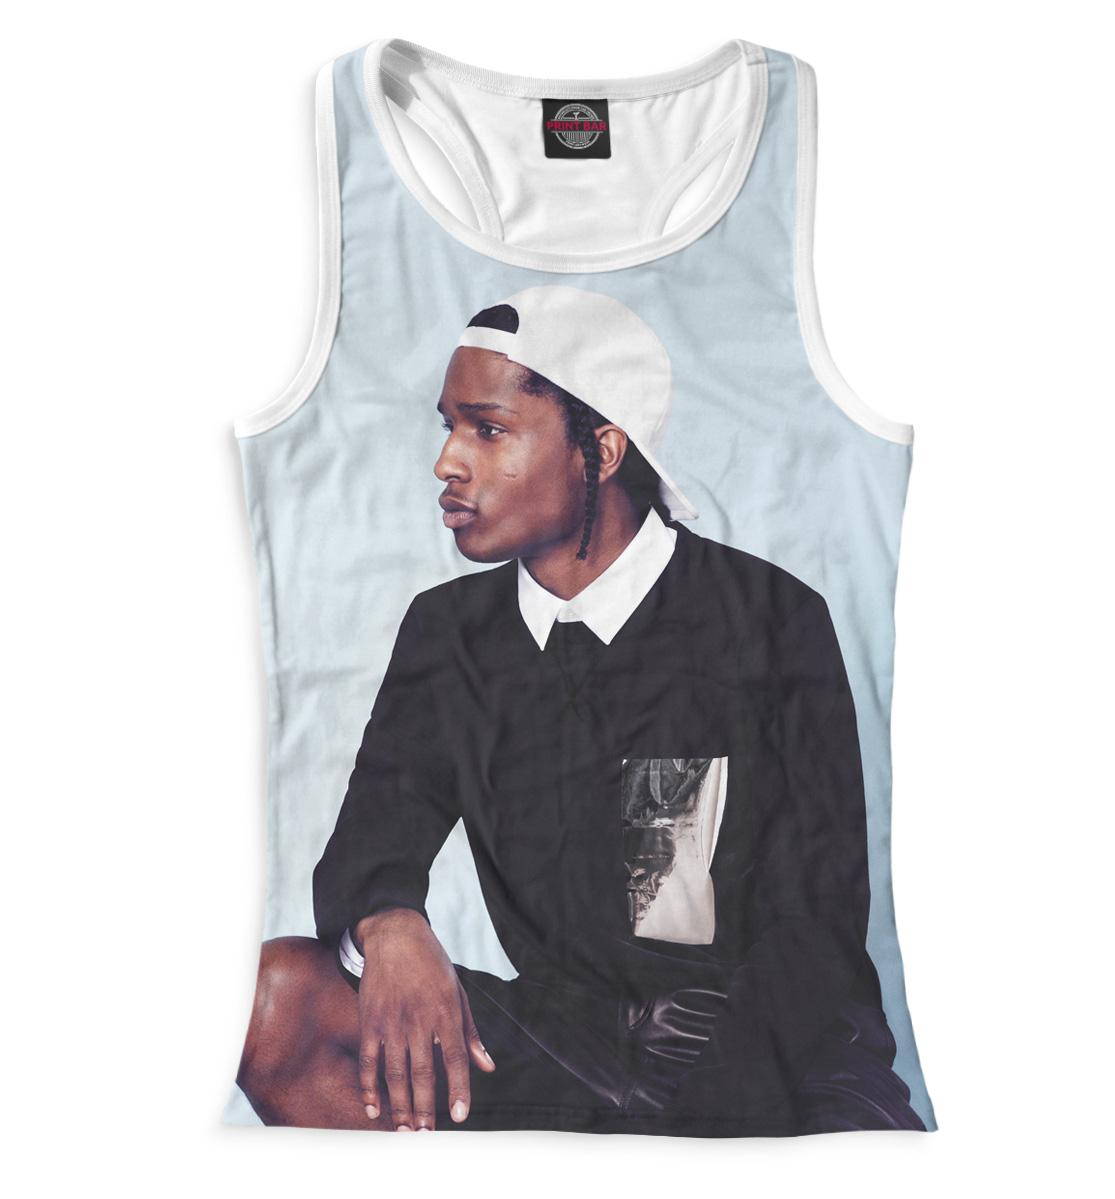 Купить A$AP Rocky, Printbar, Майки борцовки, RLG-558364-mayb-1